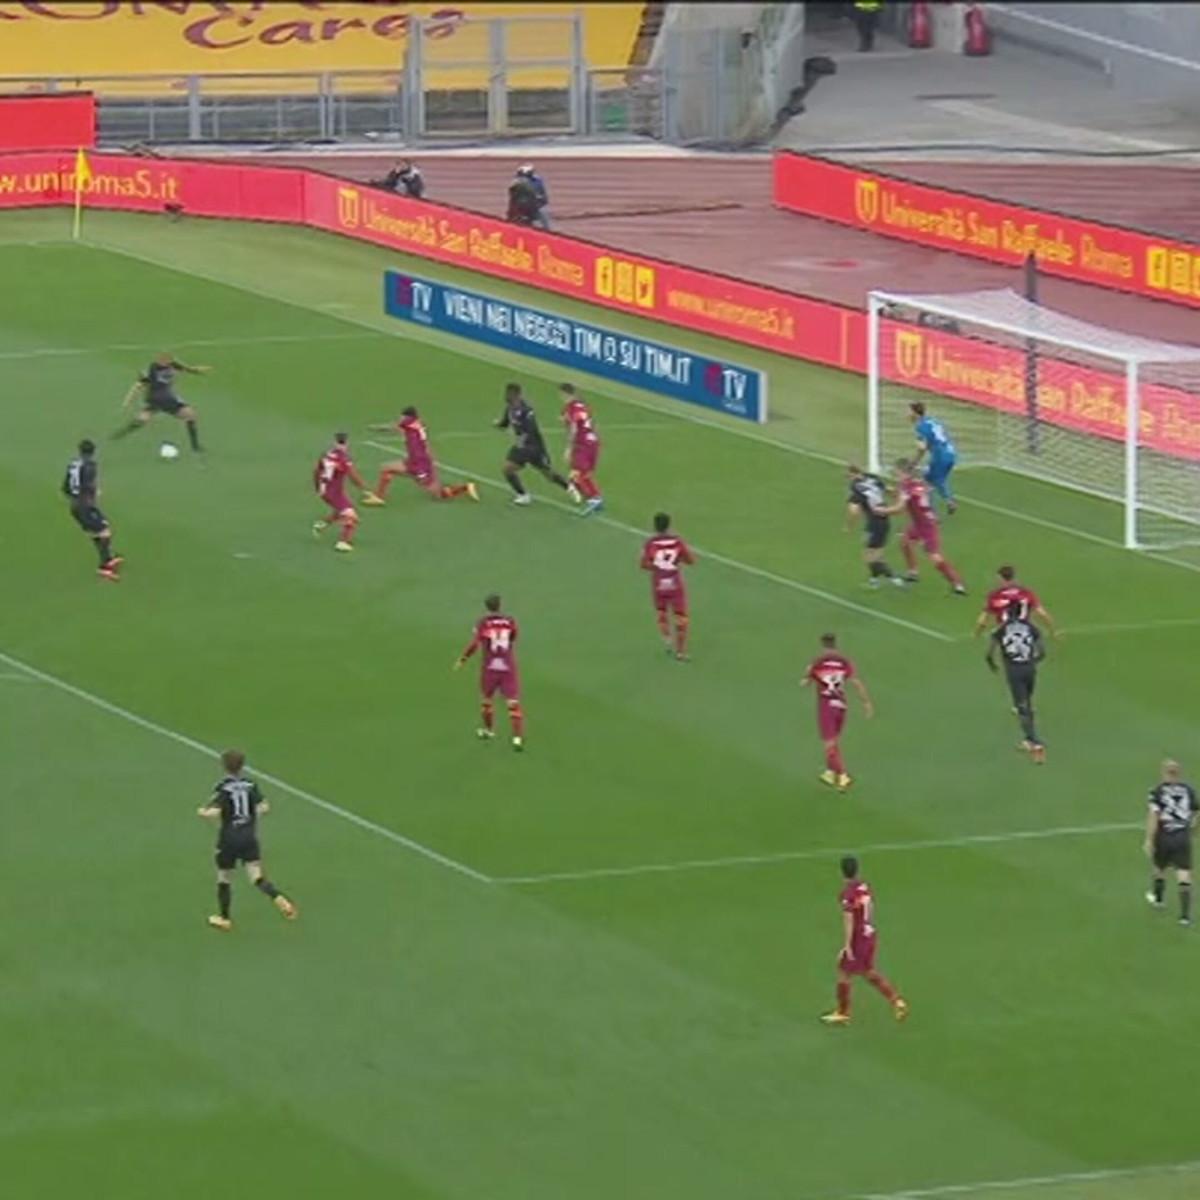 Roma-Bologna 1-0: gli highlights